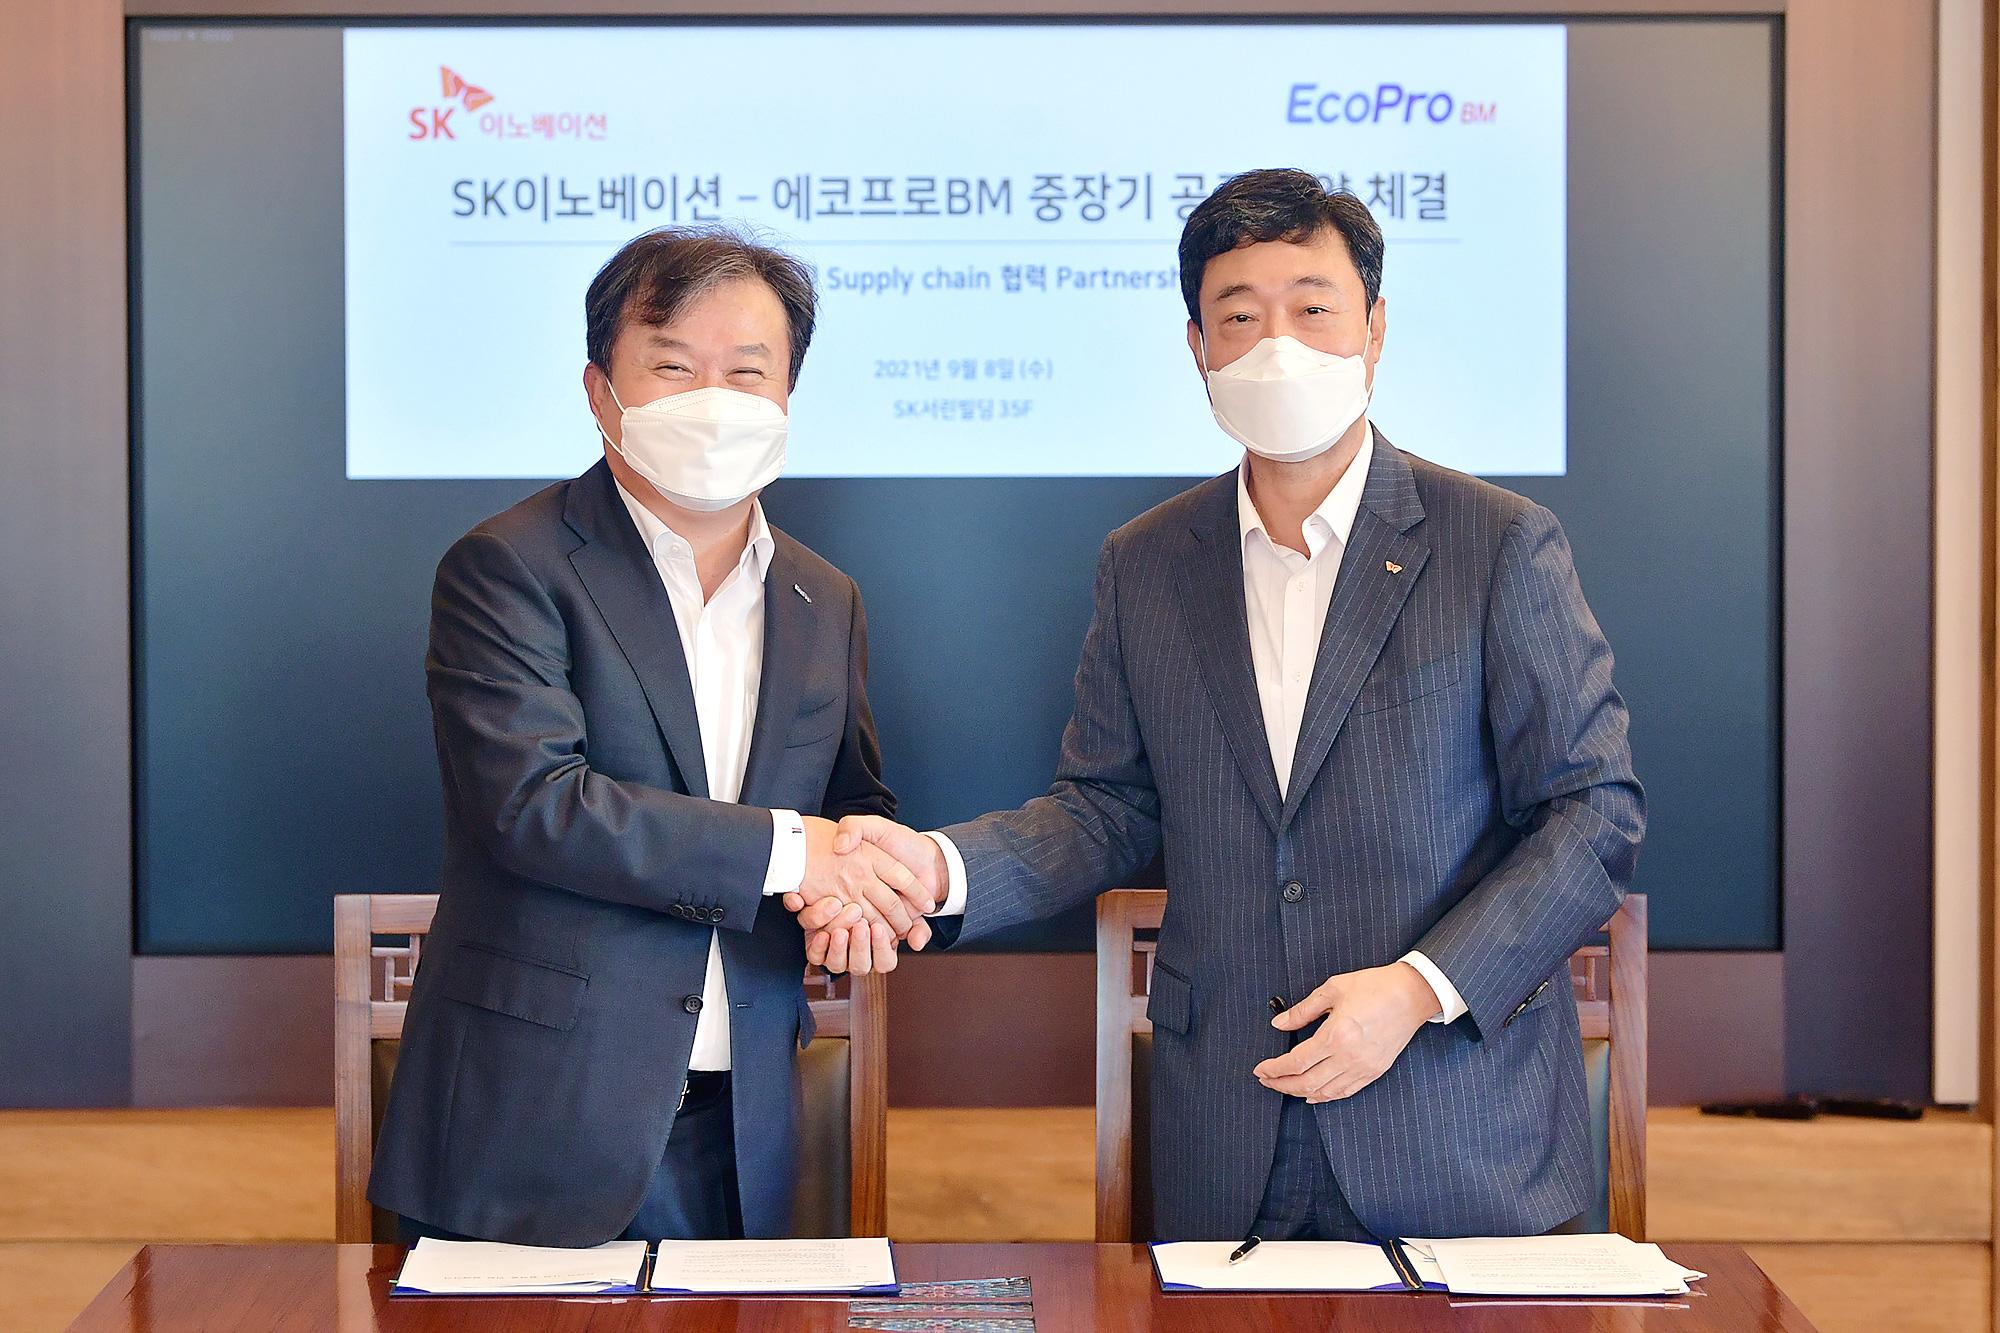 SK创新与Ecopro签署协议 采购约550亿元高镍正极材料订单